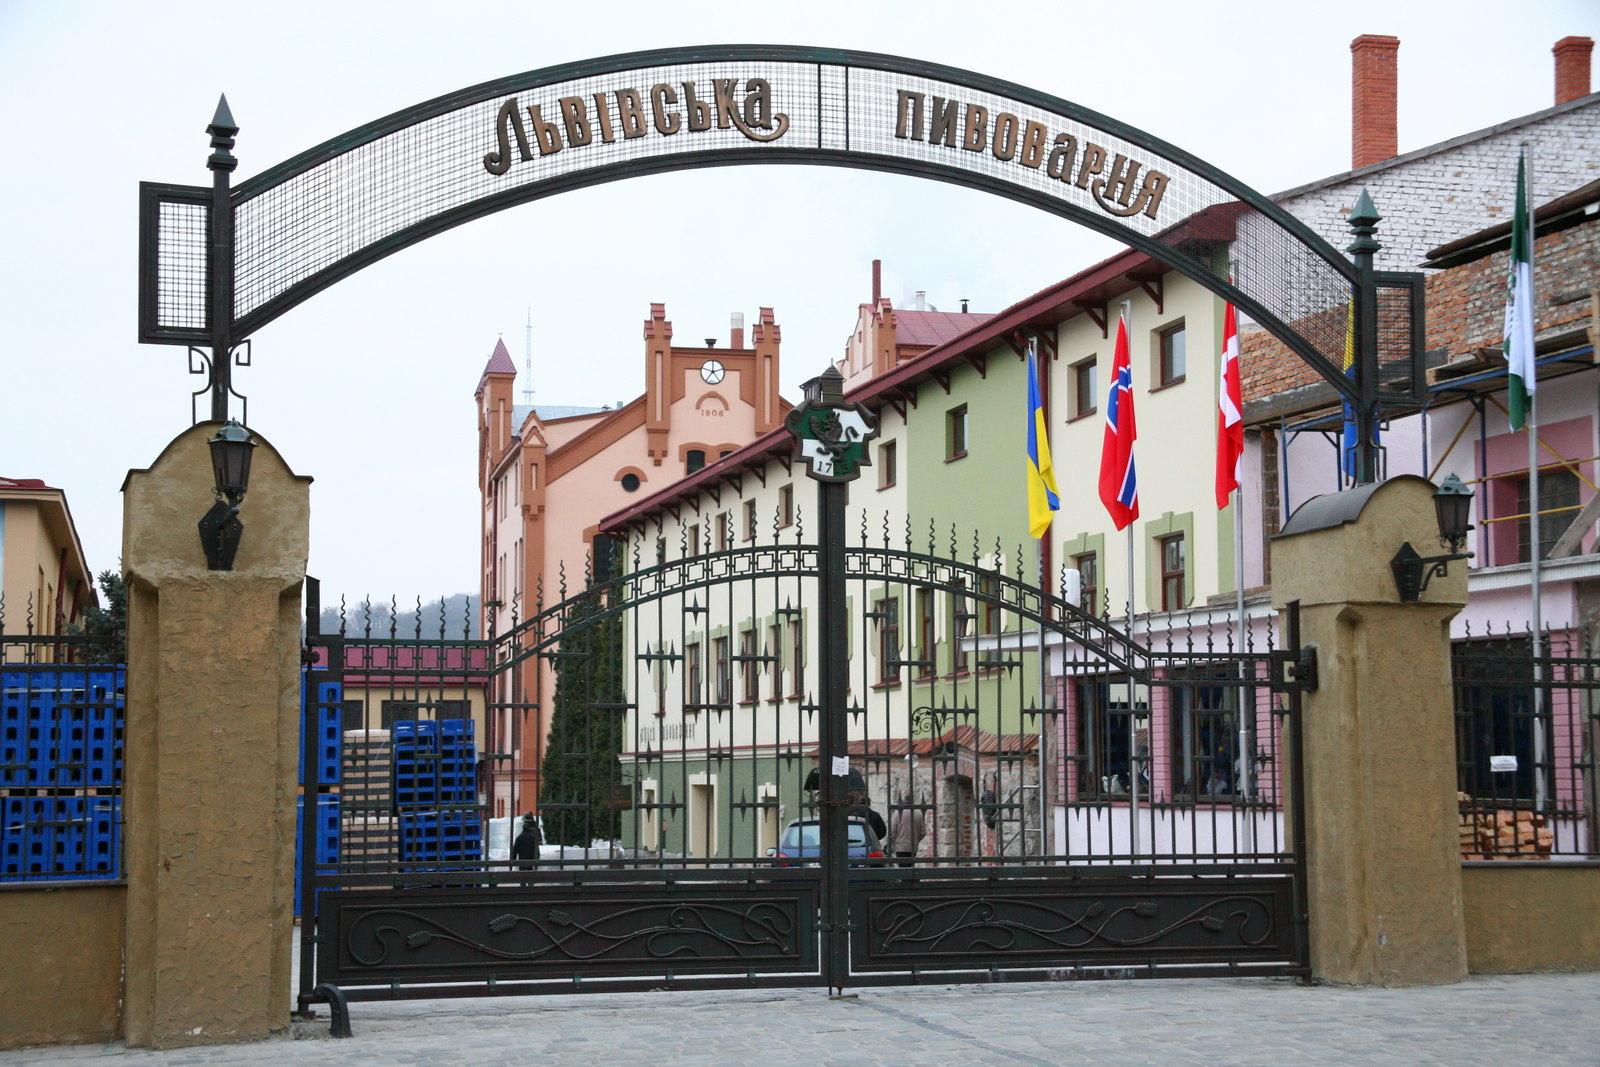 Фото: Львівська пивоварня (Львовская пивоварня)